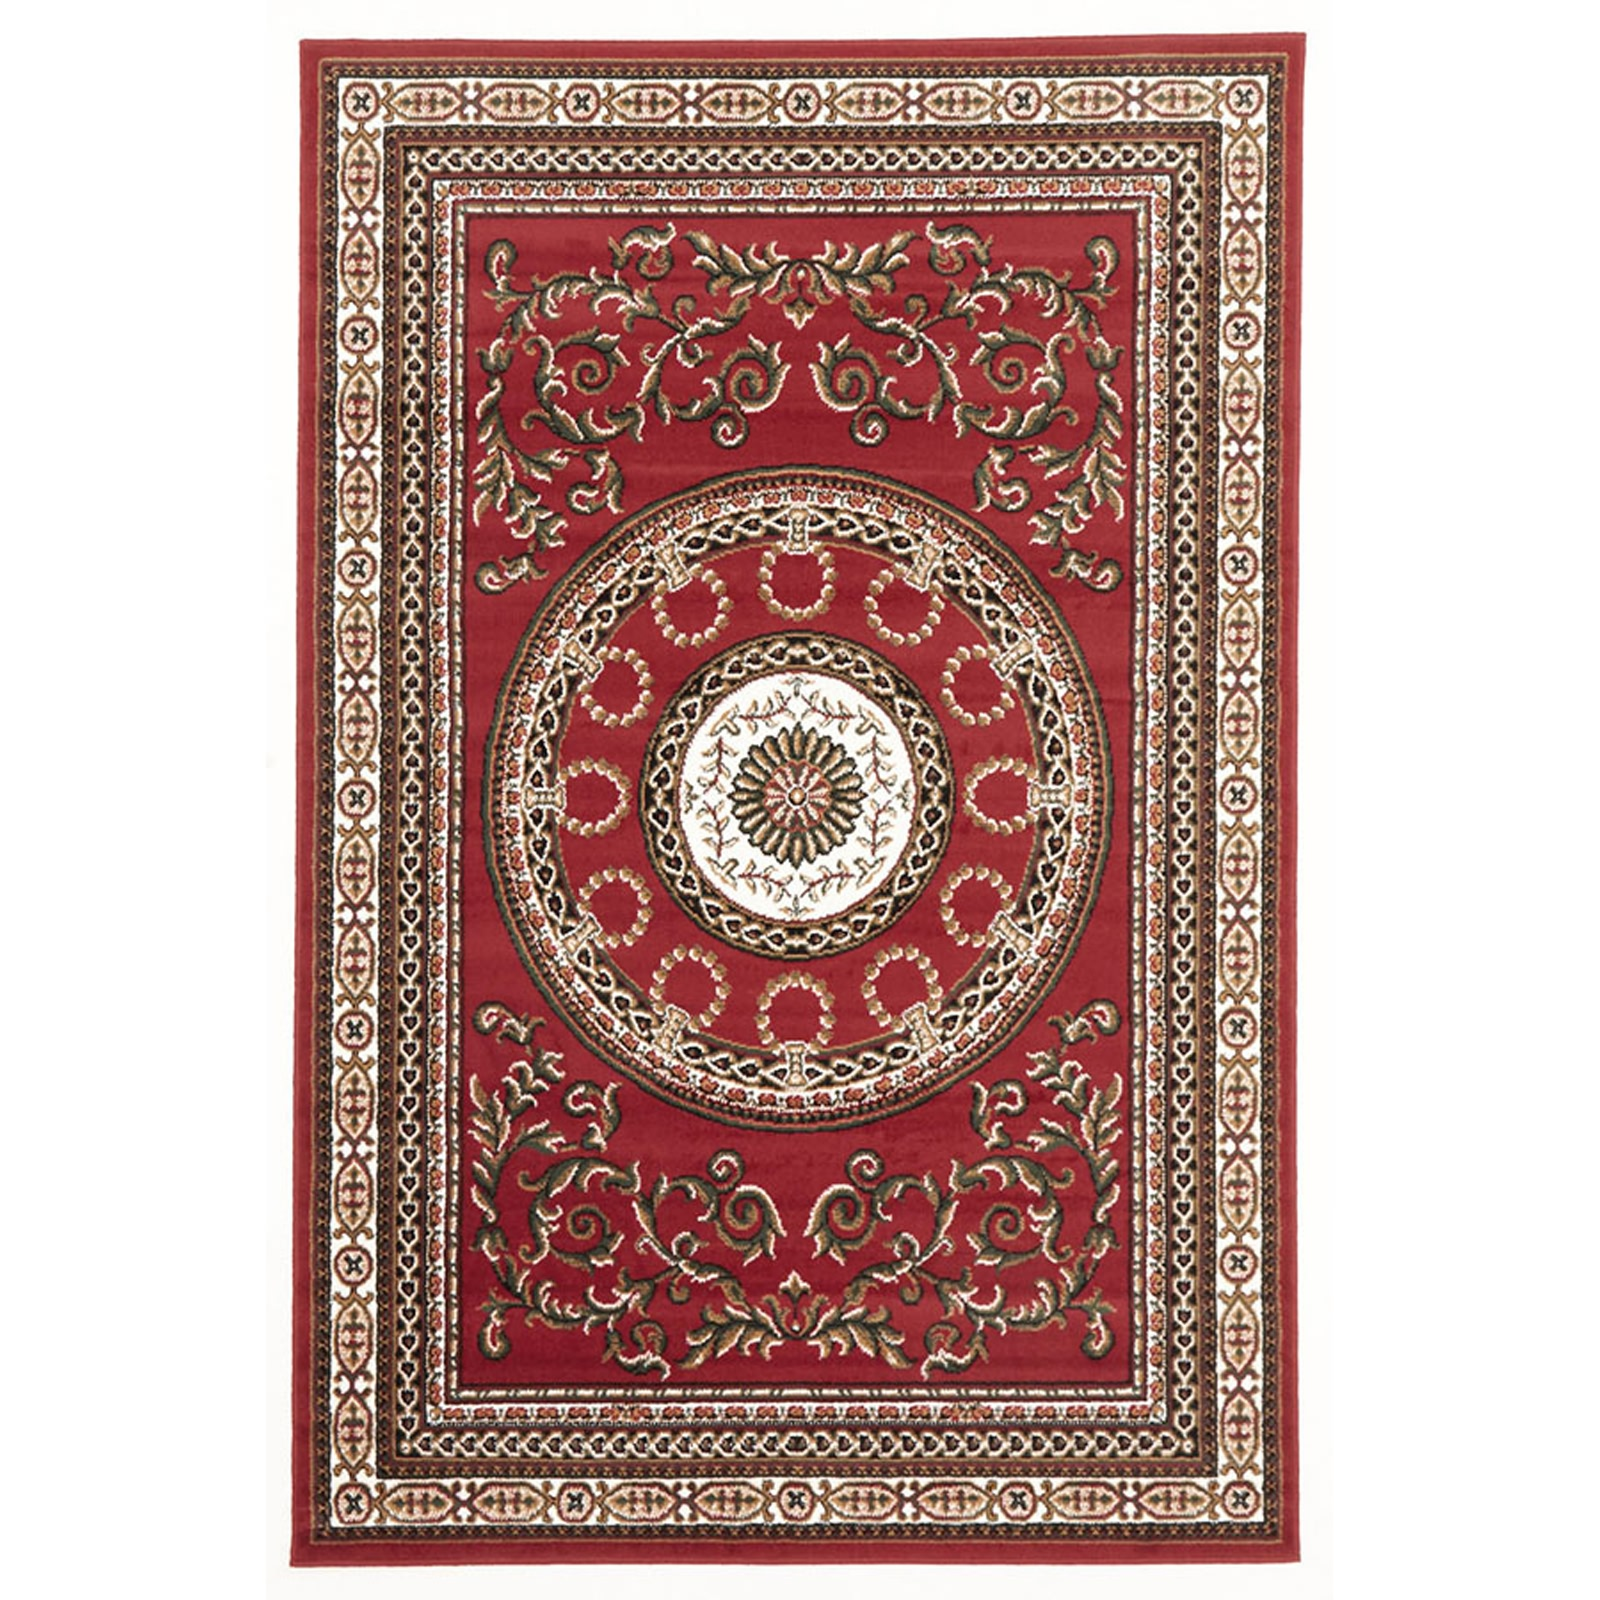 cool rug designs. New-Floor-Rug-Carpet-Mat-Ultra-Modern-Funky- Cool Rug Designs T